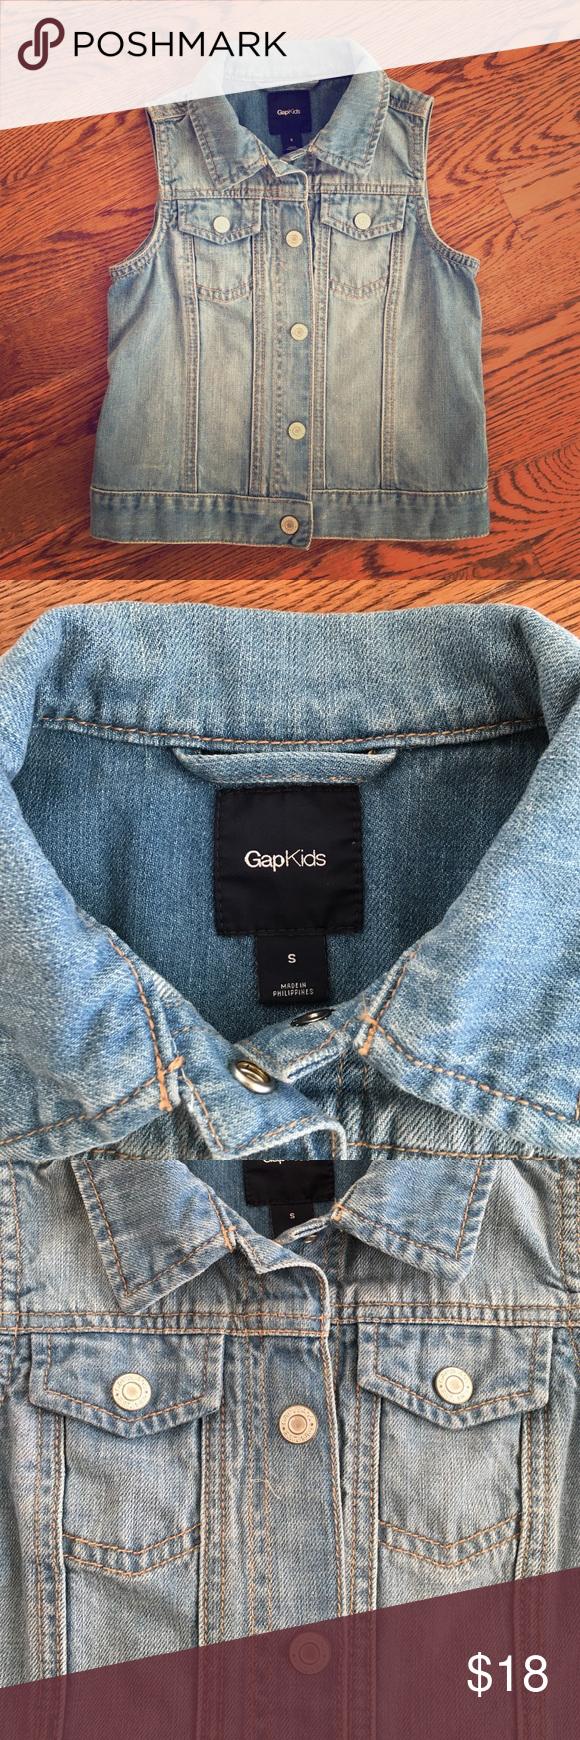 Gap Kids Denim Vest NWOT Never worn! GAP Jackets & Coats Vests